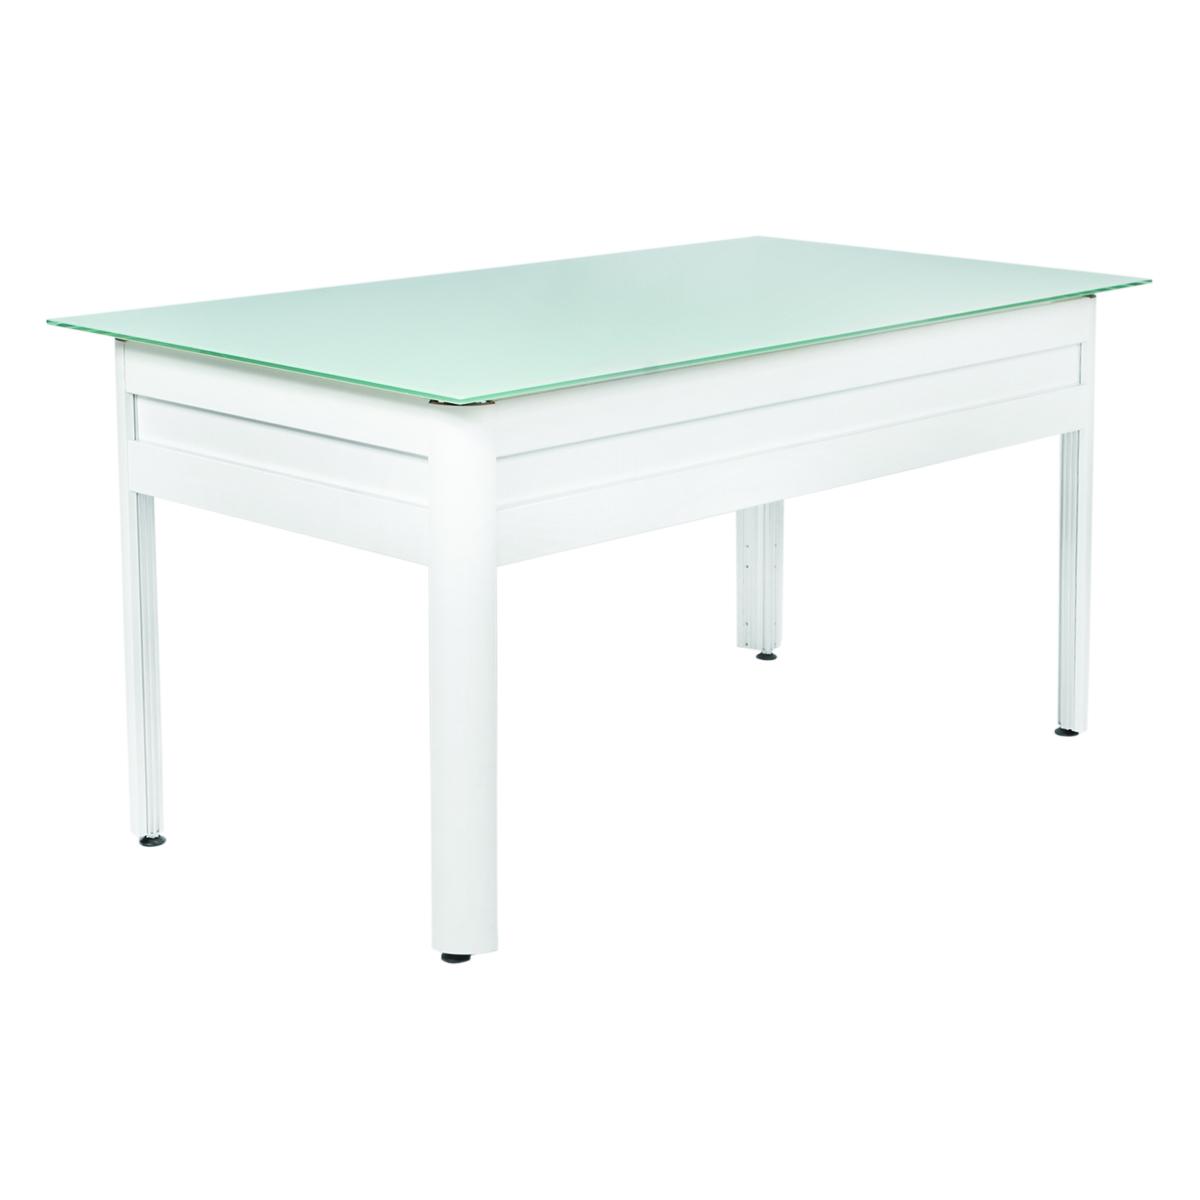 bureau city blanc plateau verre blanc opaque 150x80 internation moduling. Black Bedroom Furniture Sets. Home Design Ideas